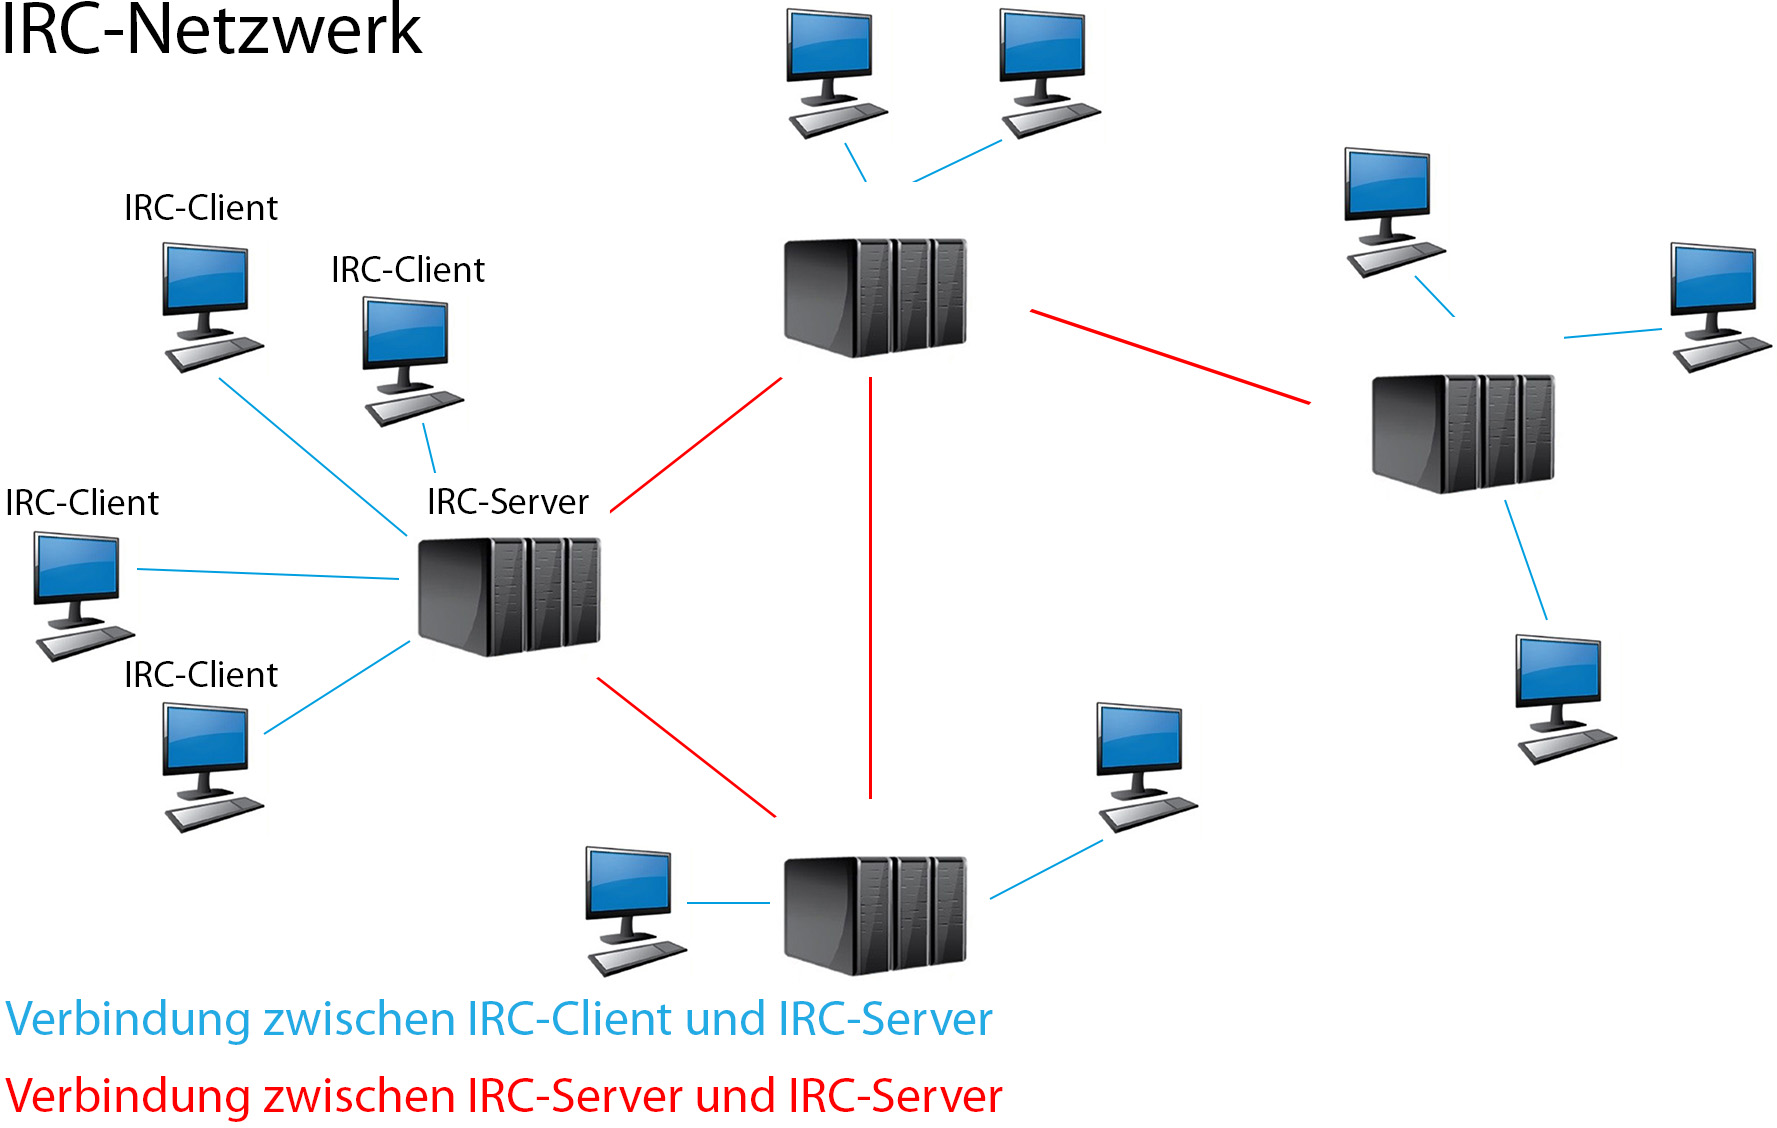 irc-netzwerk